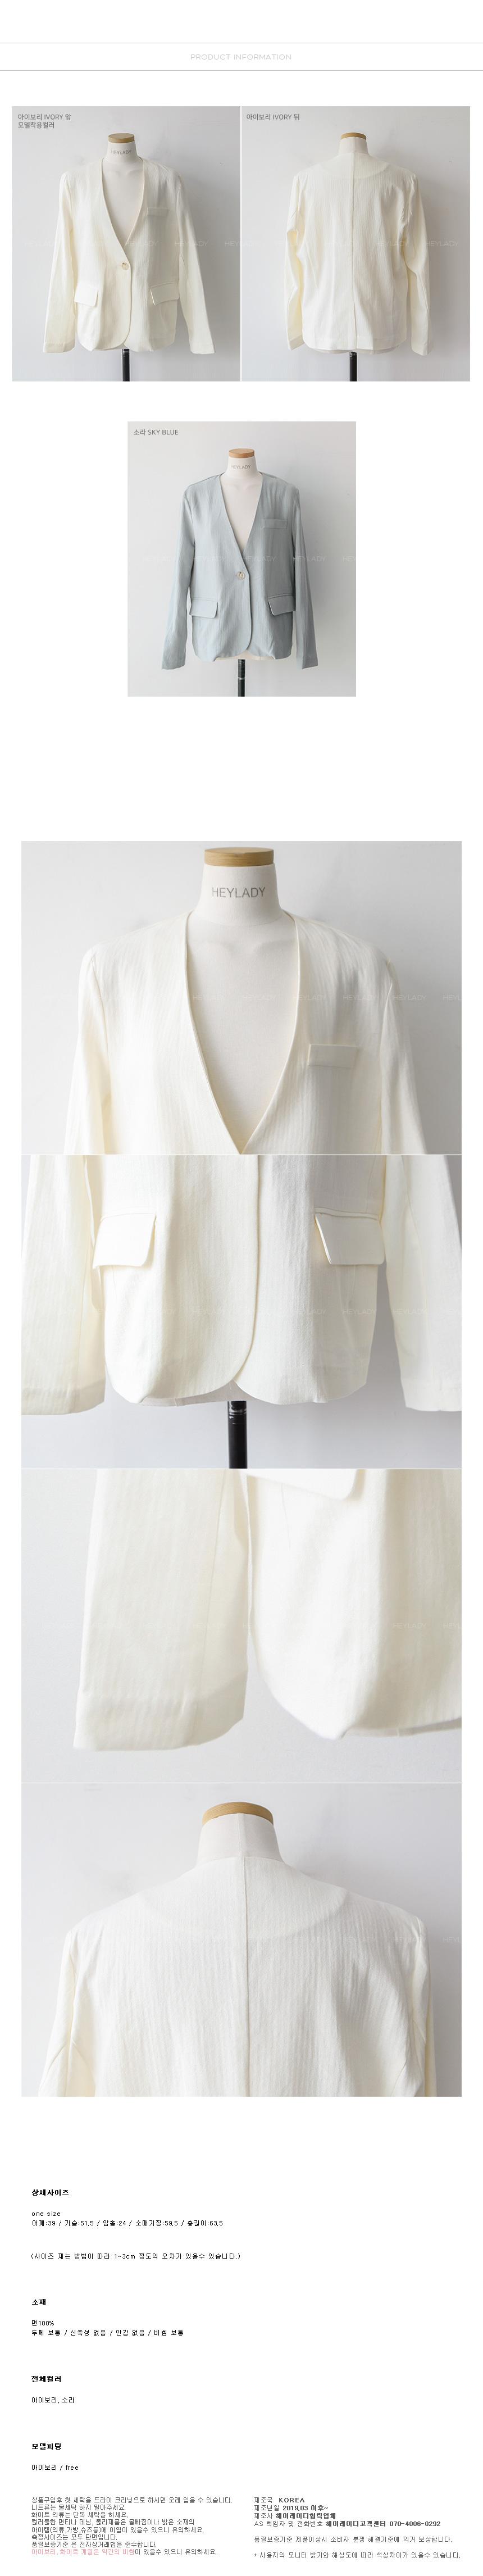 West Nokara Cotton Jacket